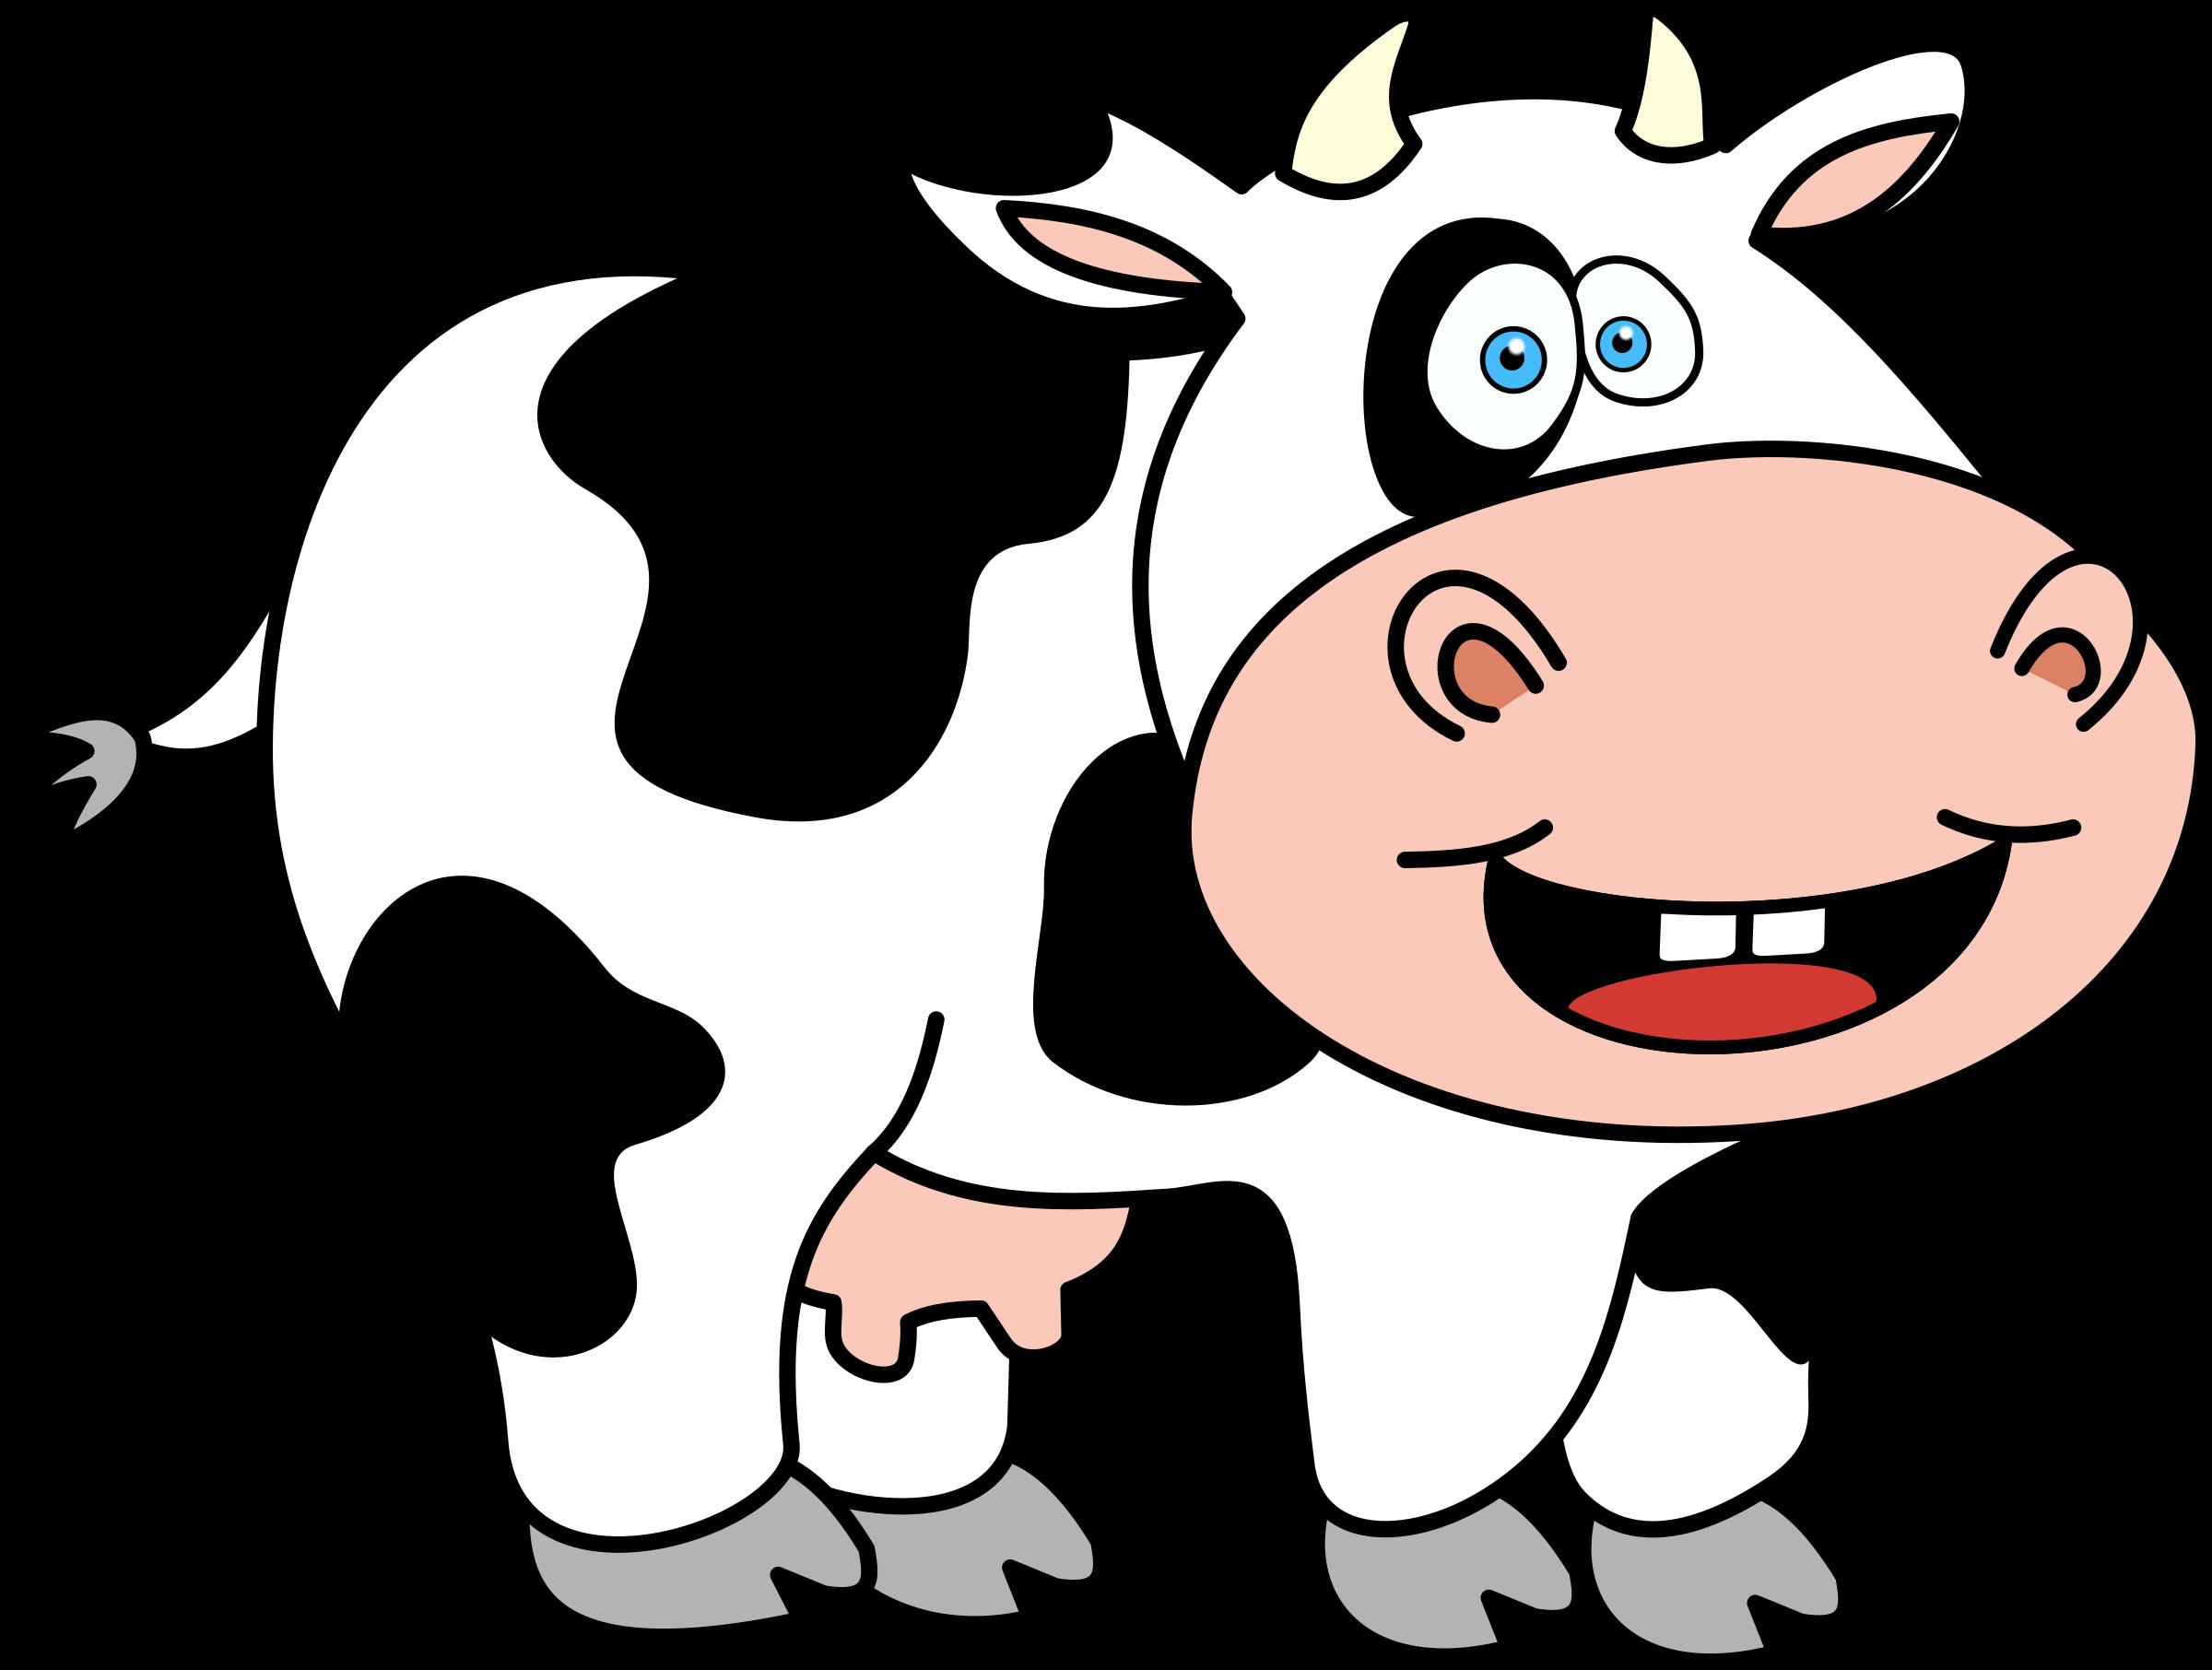 Open clipart cartoon cow #7